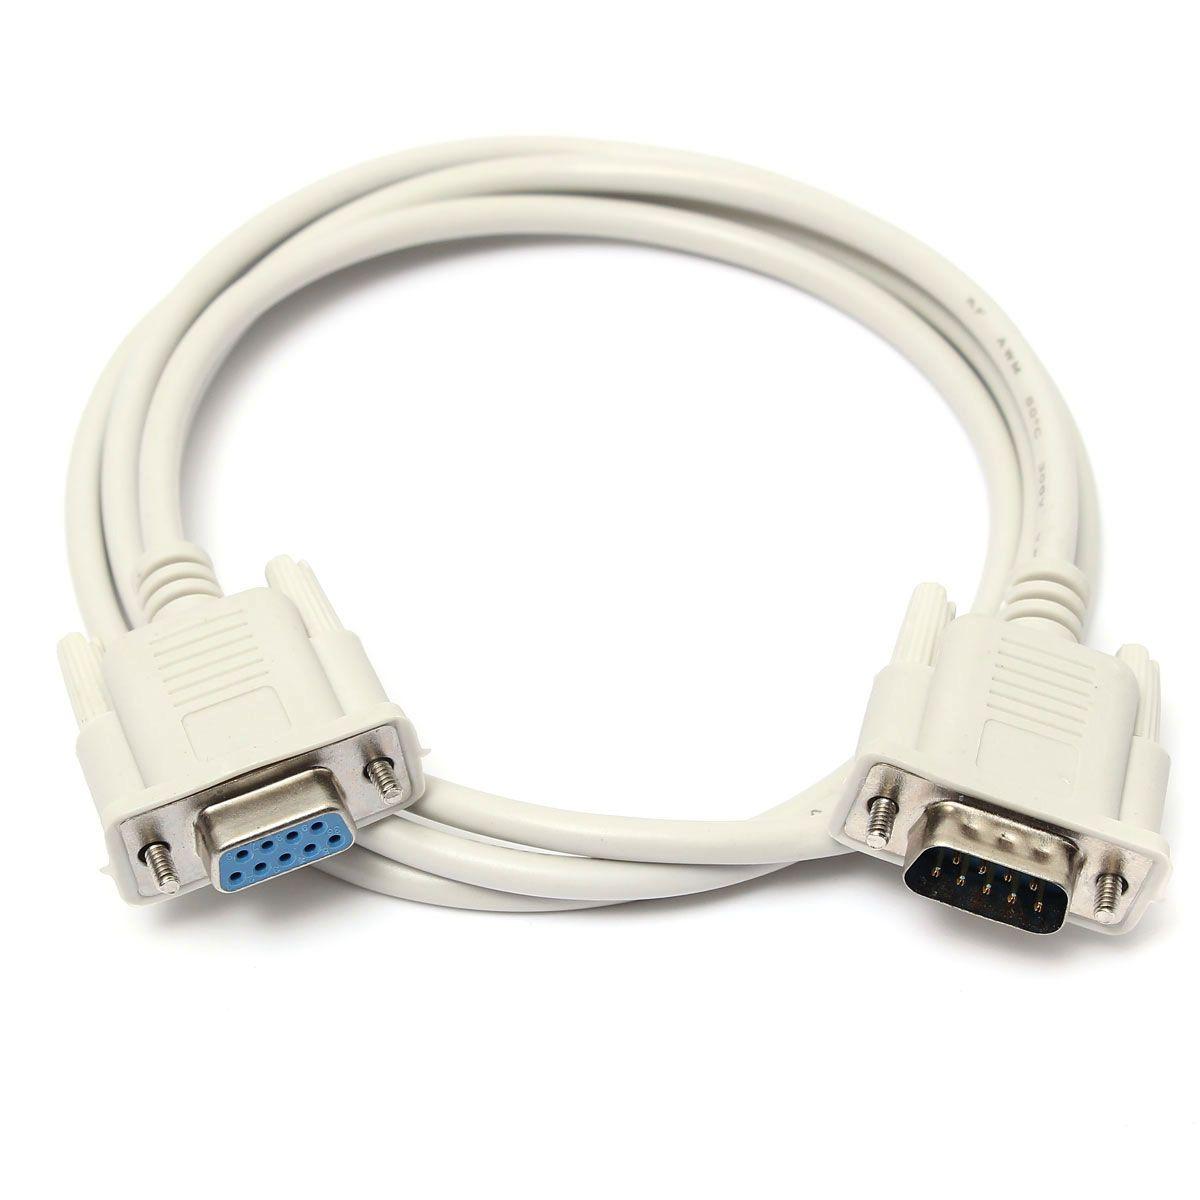 1 5m 9 Pin Rs232 Serial Db9 Male To Female Data Cable Gift Diy Home Homedecor Rustic Wedding Valentine Accessories Beauty Uzatma Kablosu Kablo Sadakat